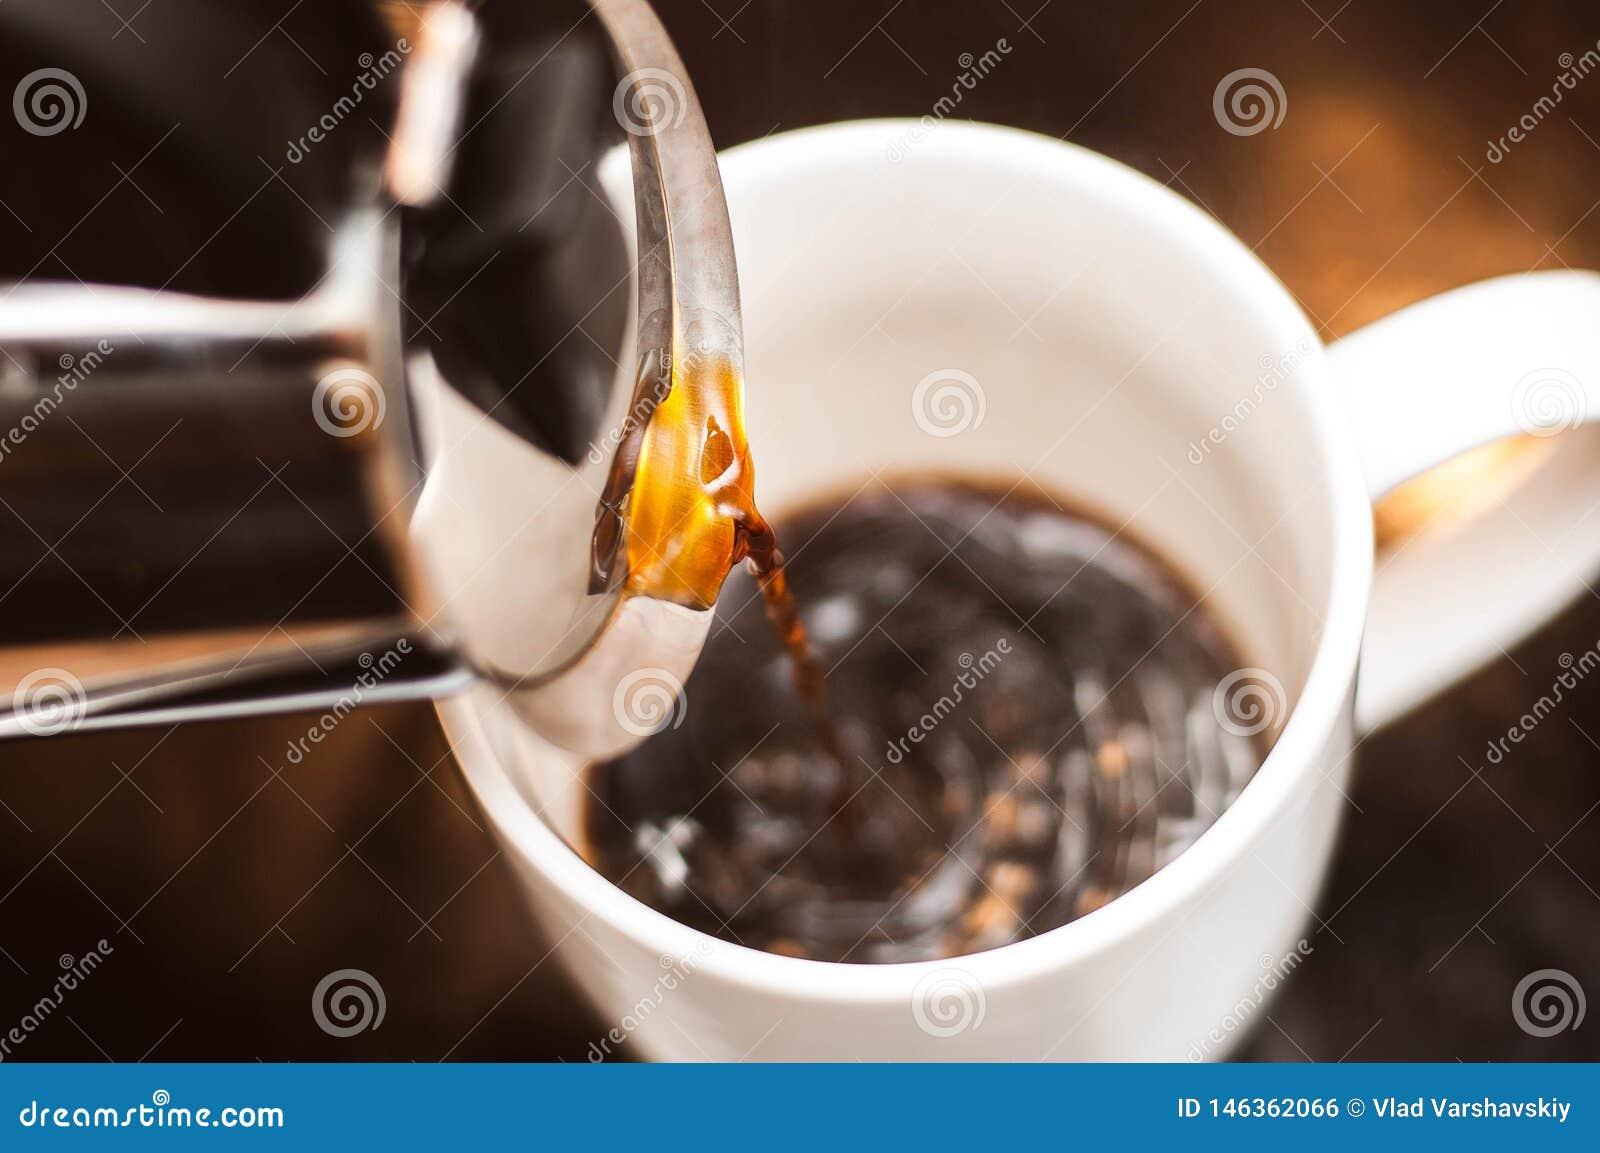 Preparaci?n del caf? de la ma?ana como el mejor comienzo al d?a